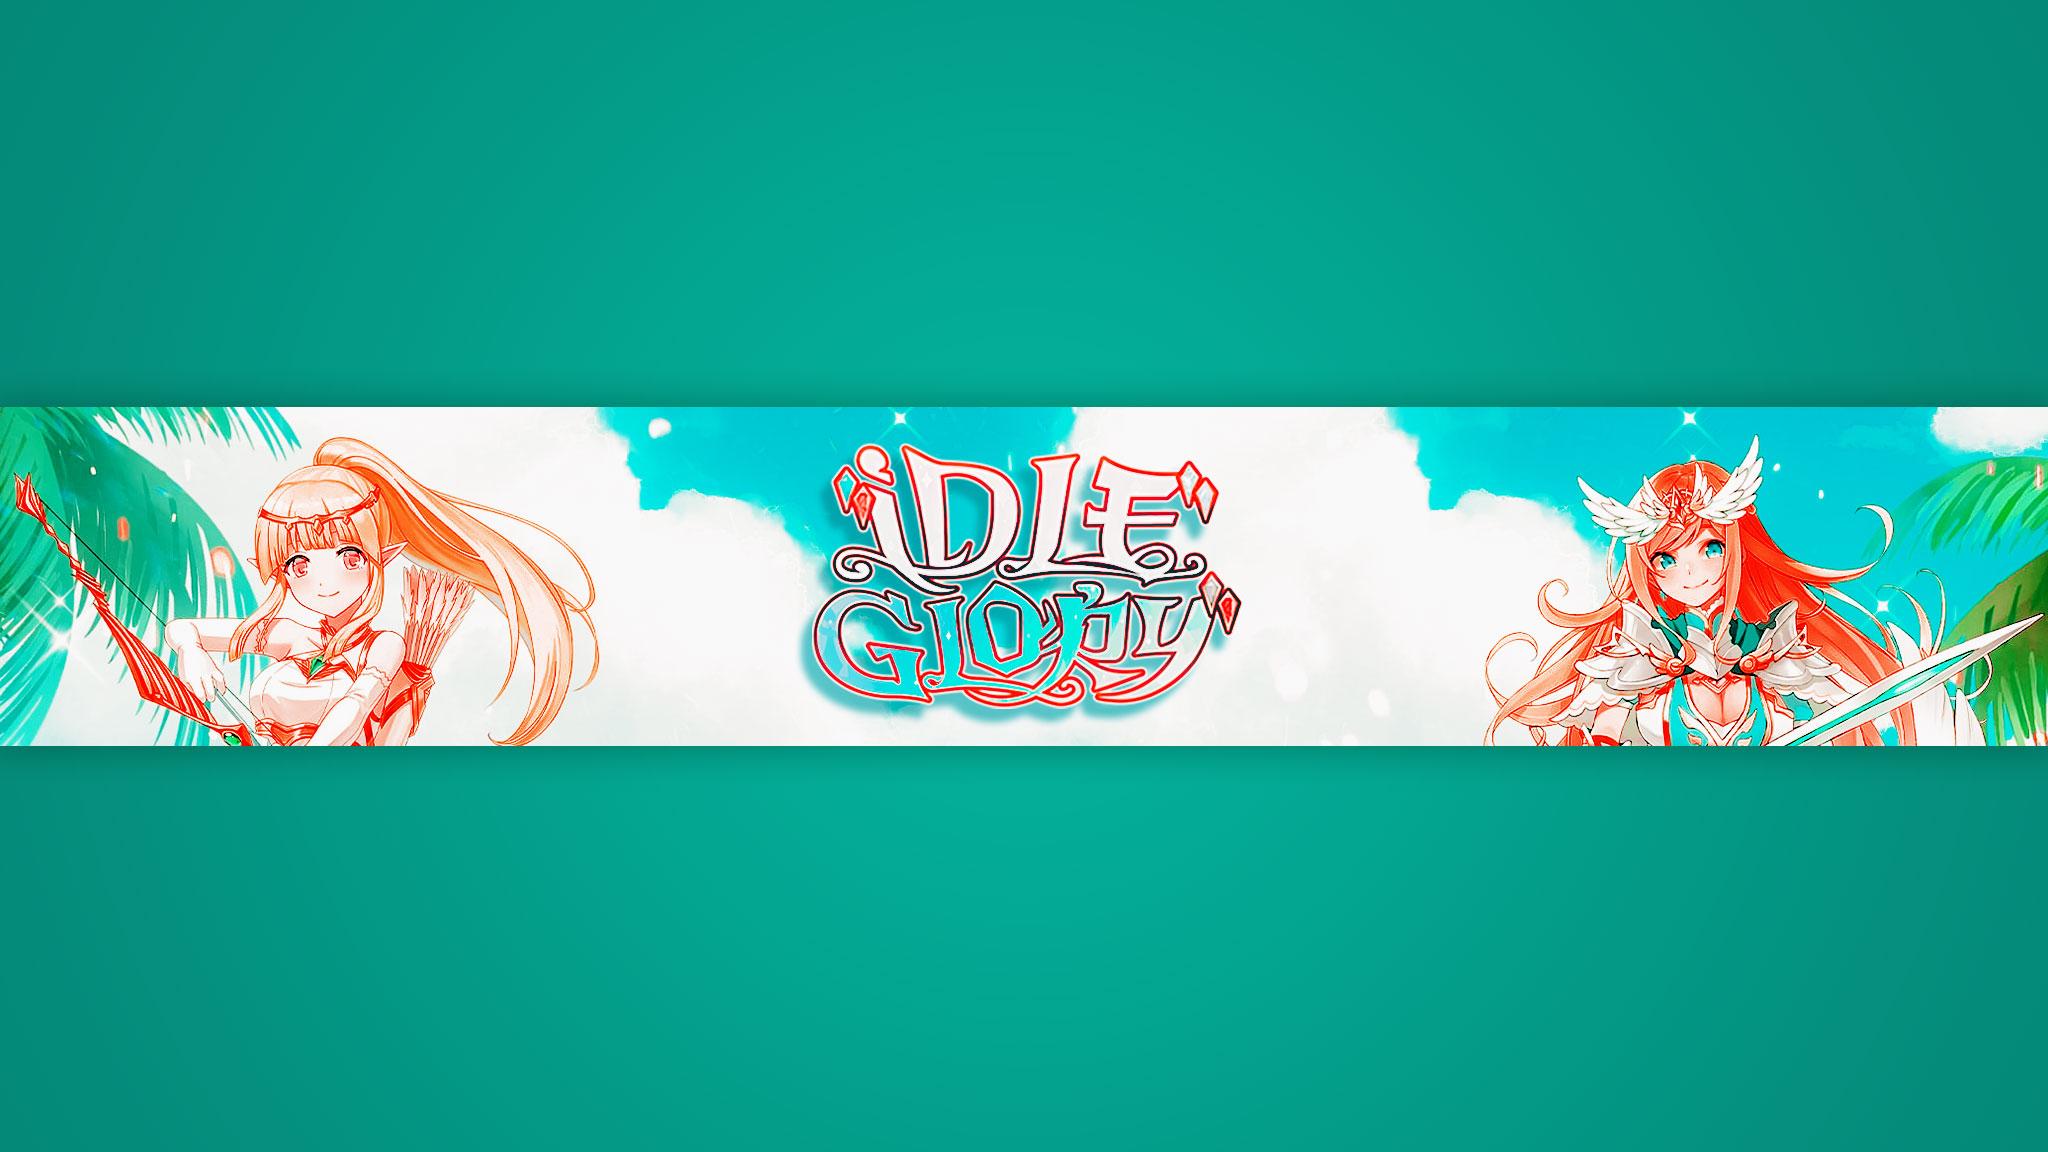 Картинка бирюзового цвета на шапки для ютуба 2048x1152 с аниме персонажами и надписью IDLE Glory.